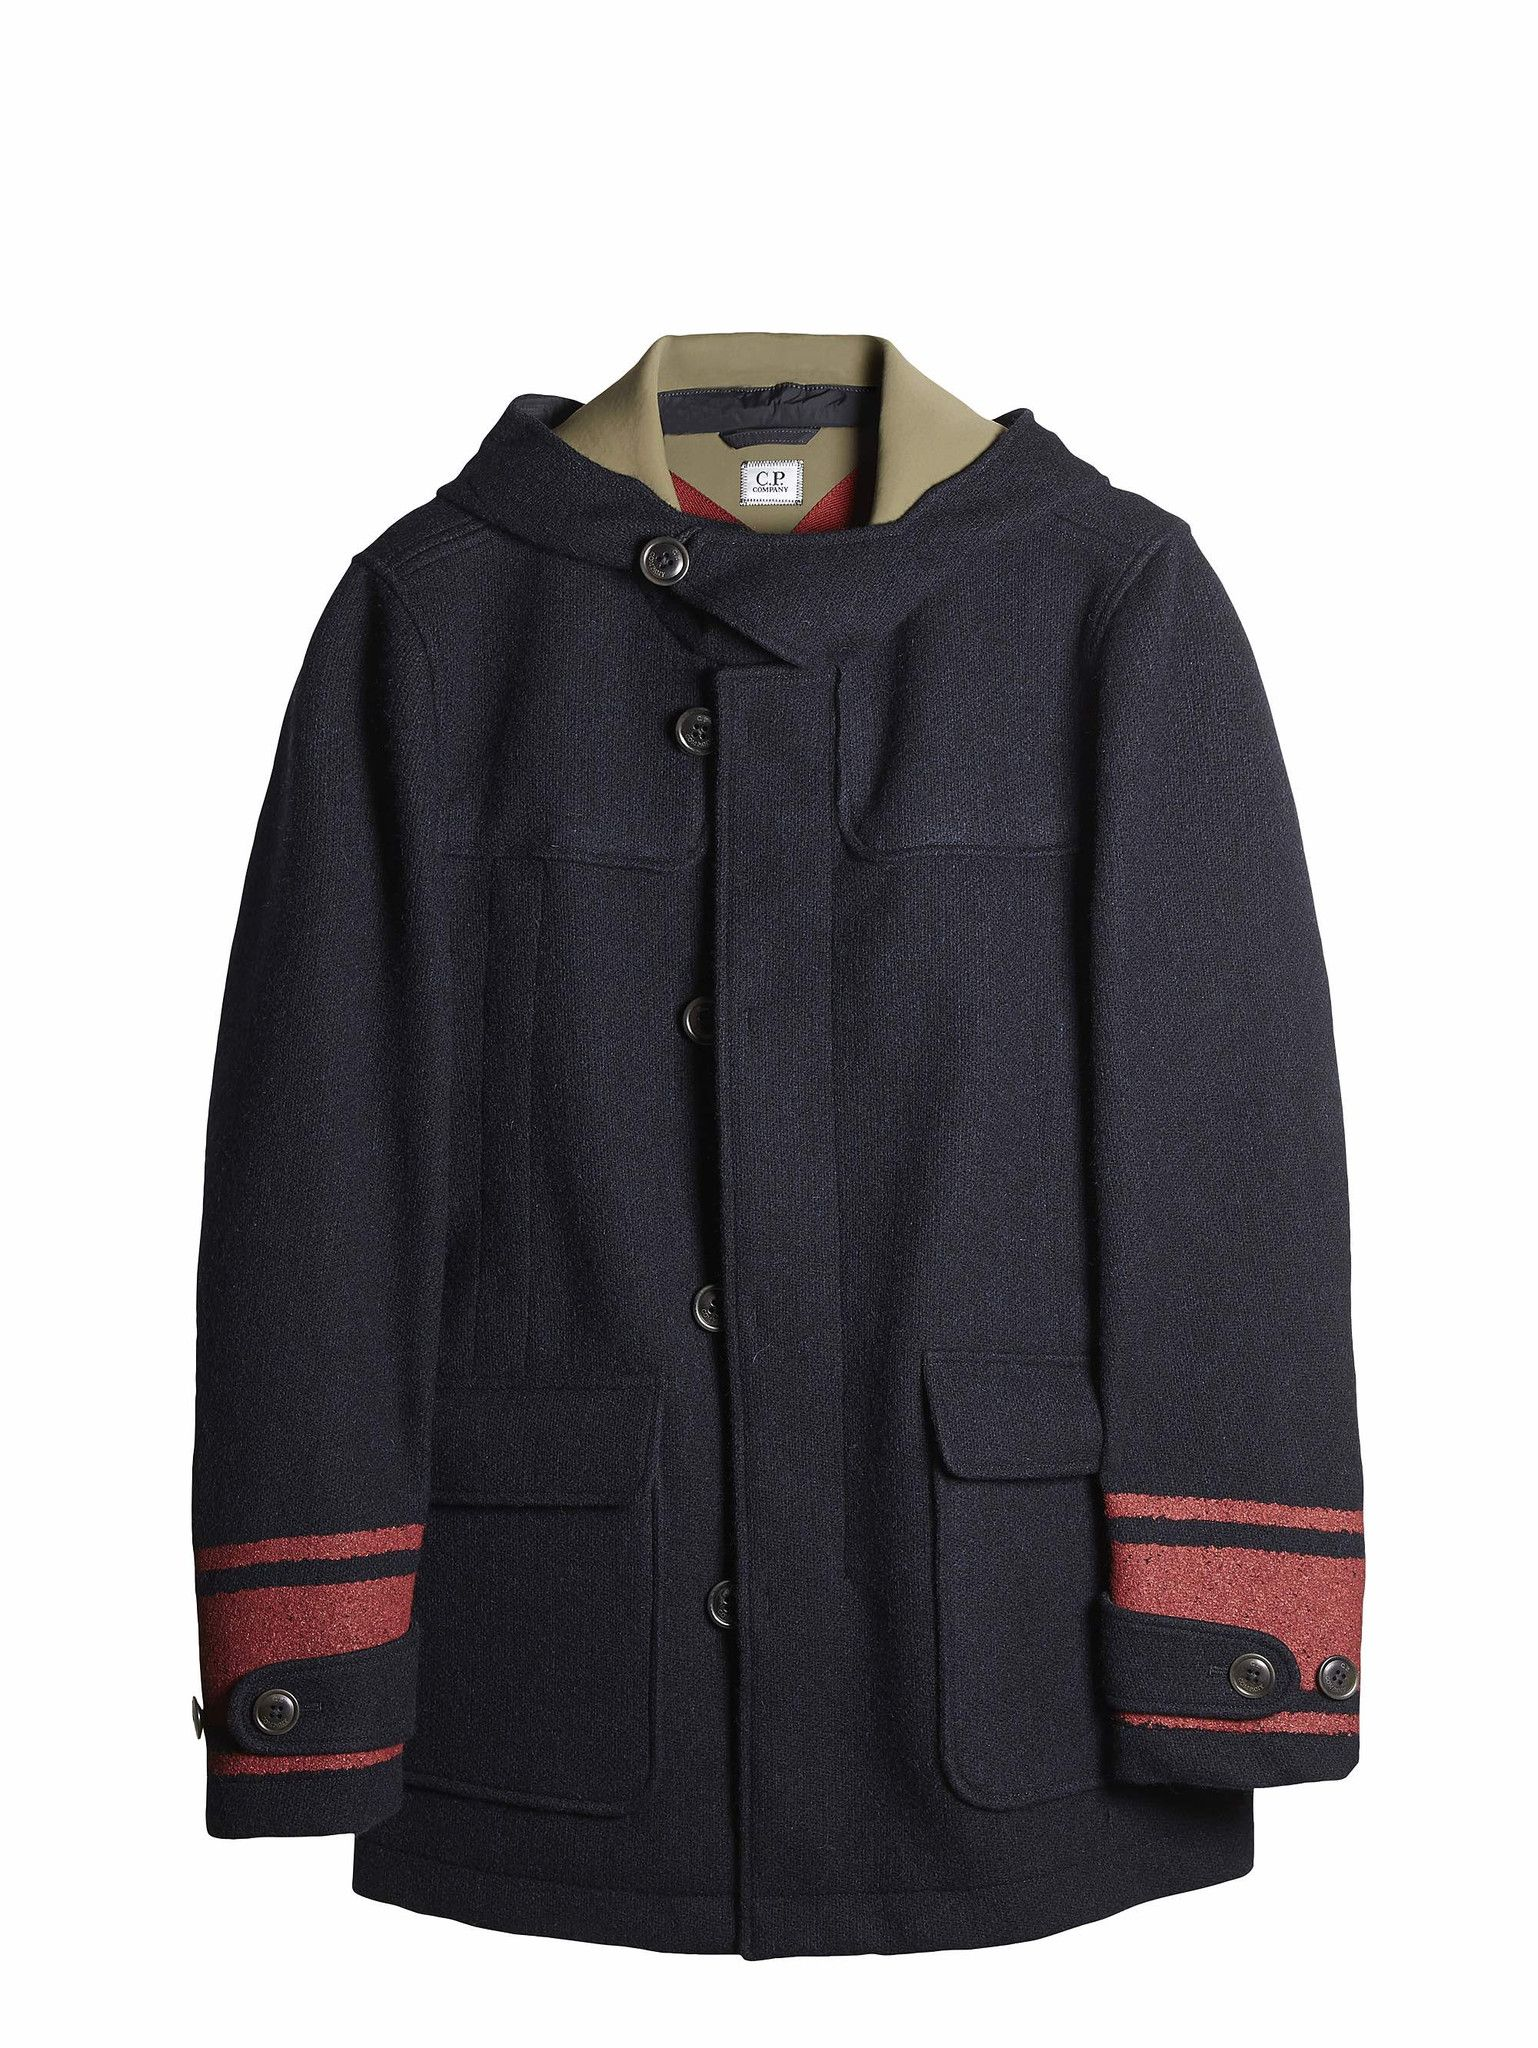 C.P. Company Shetland SL Wool Duffle Coat in Navy Blue | Tex_Lana ...